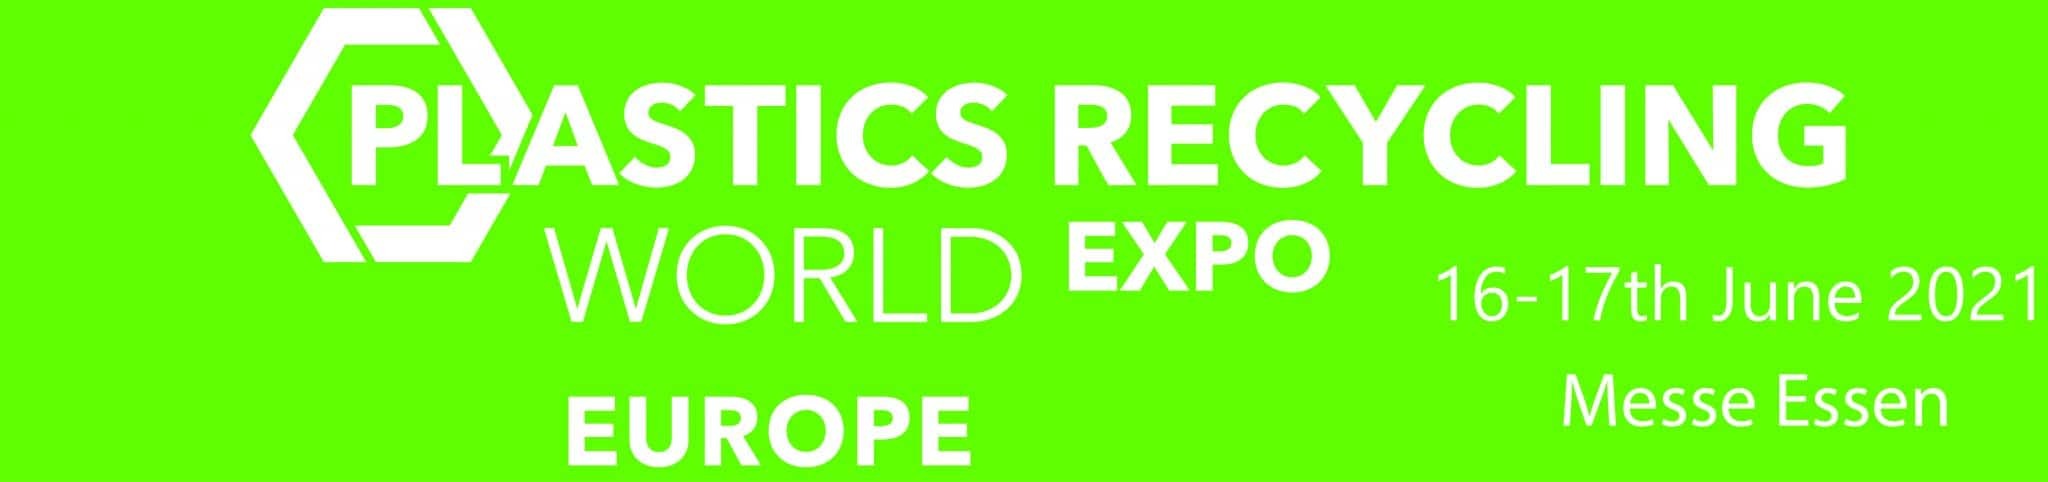 Plastics Recycling World Expo 2021, 16 - 17 June, Essen, Germany